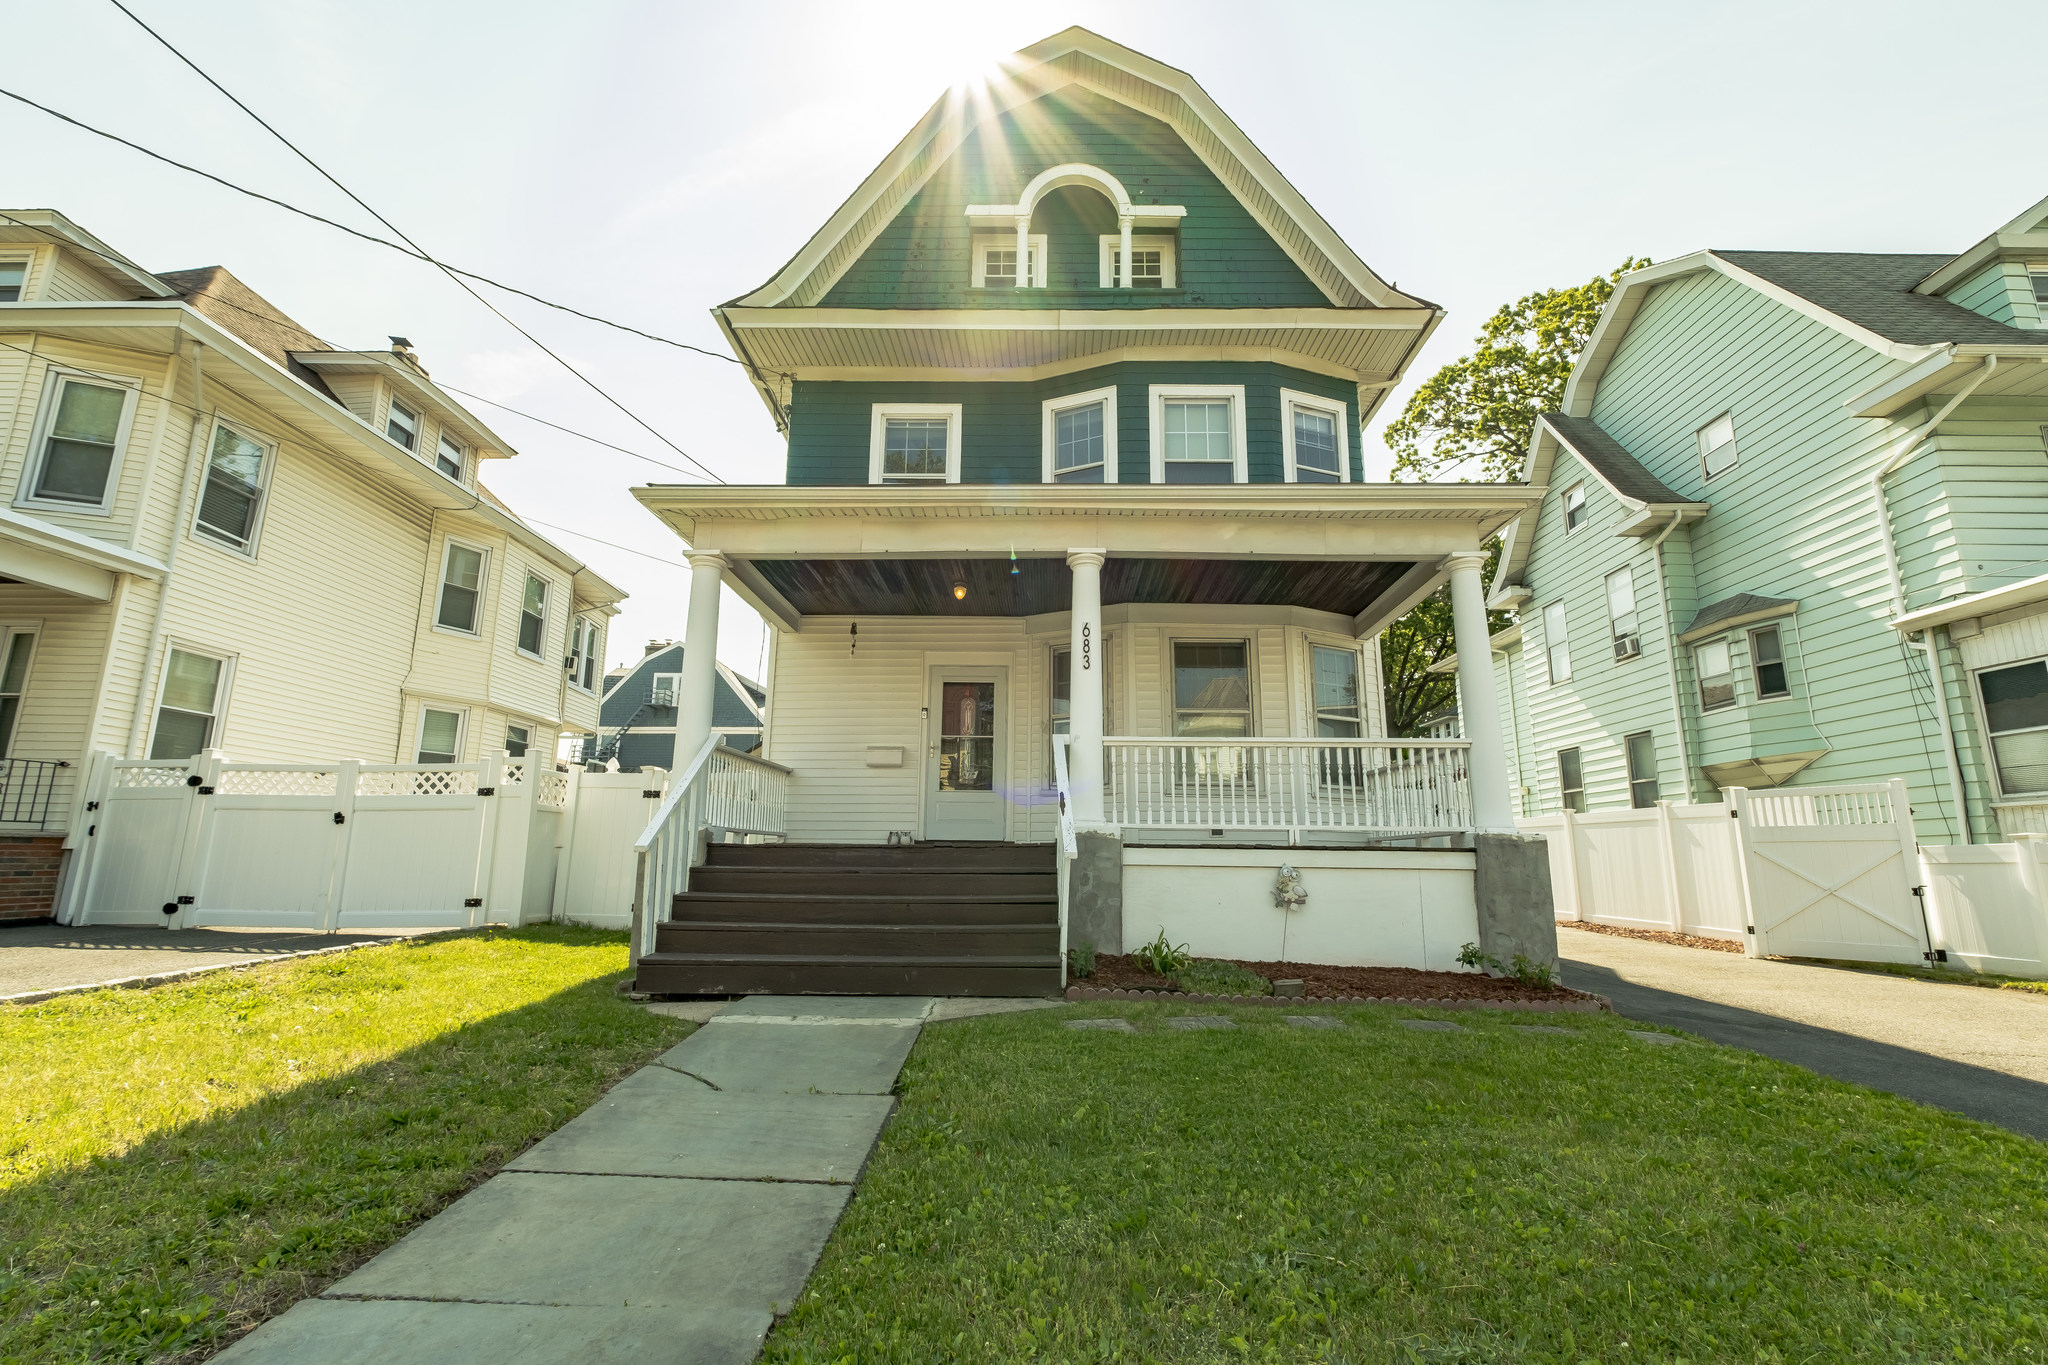 681-683 Highland Avenue Single family home